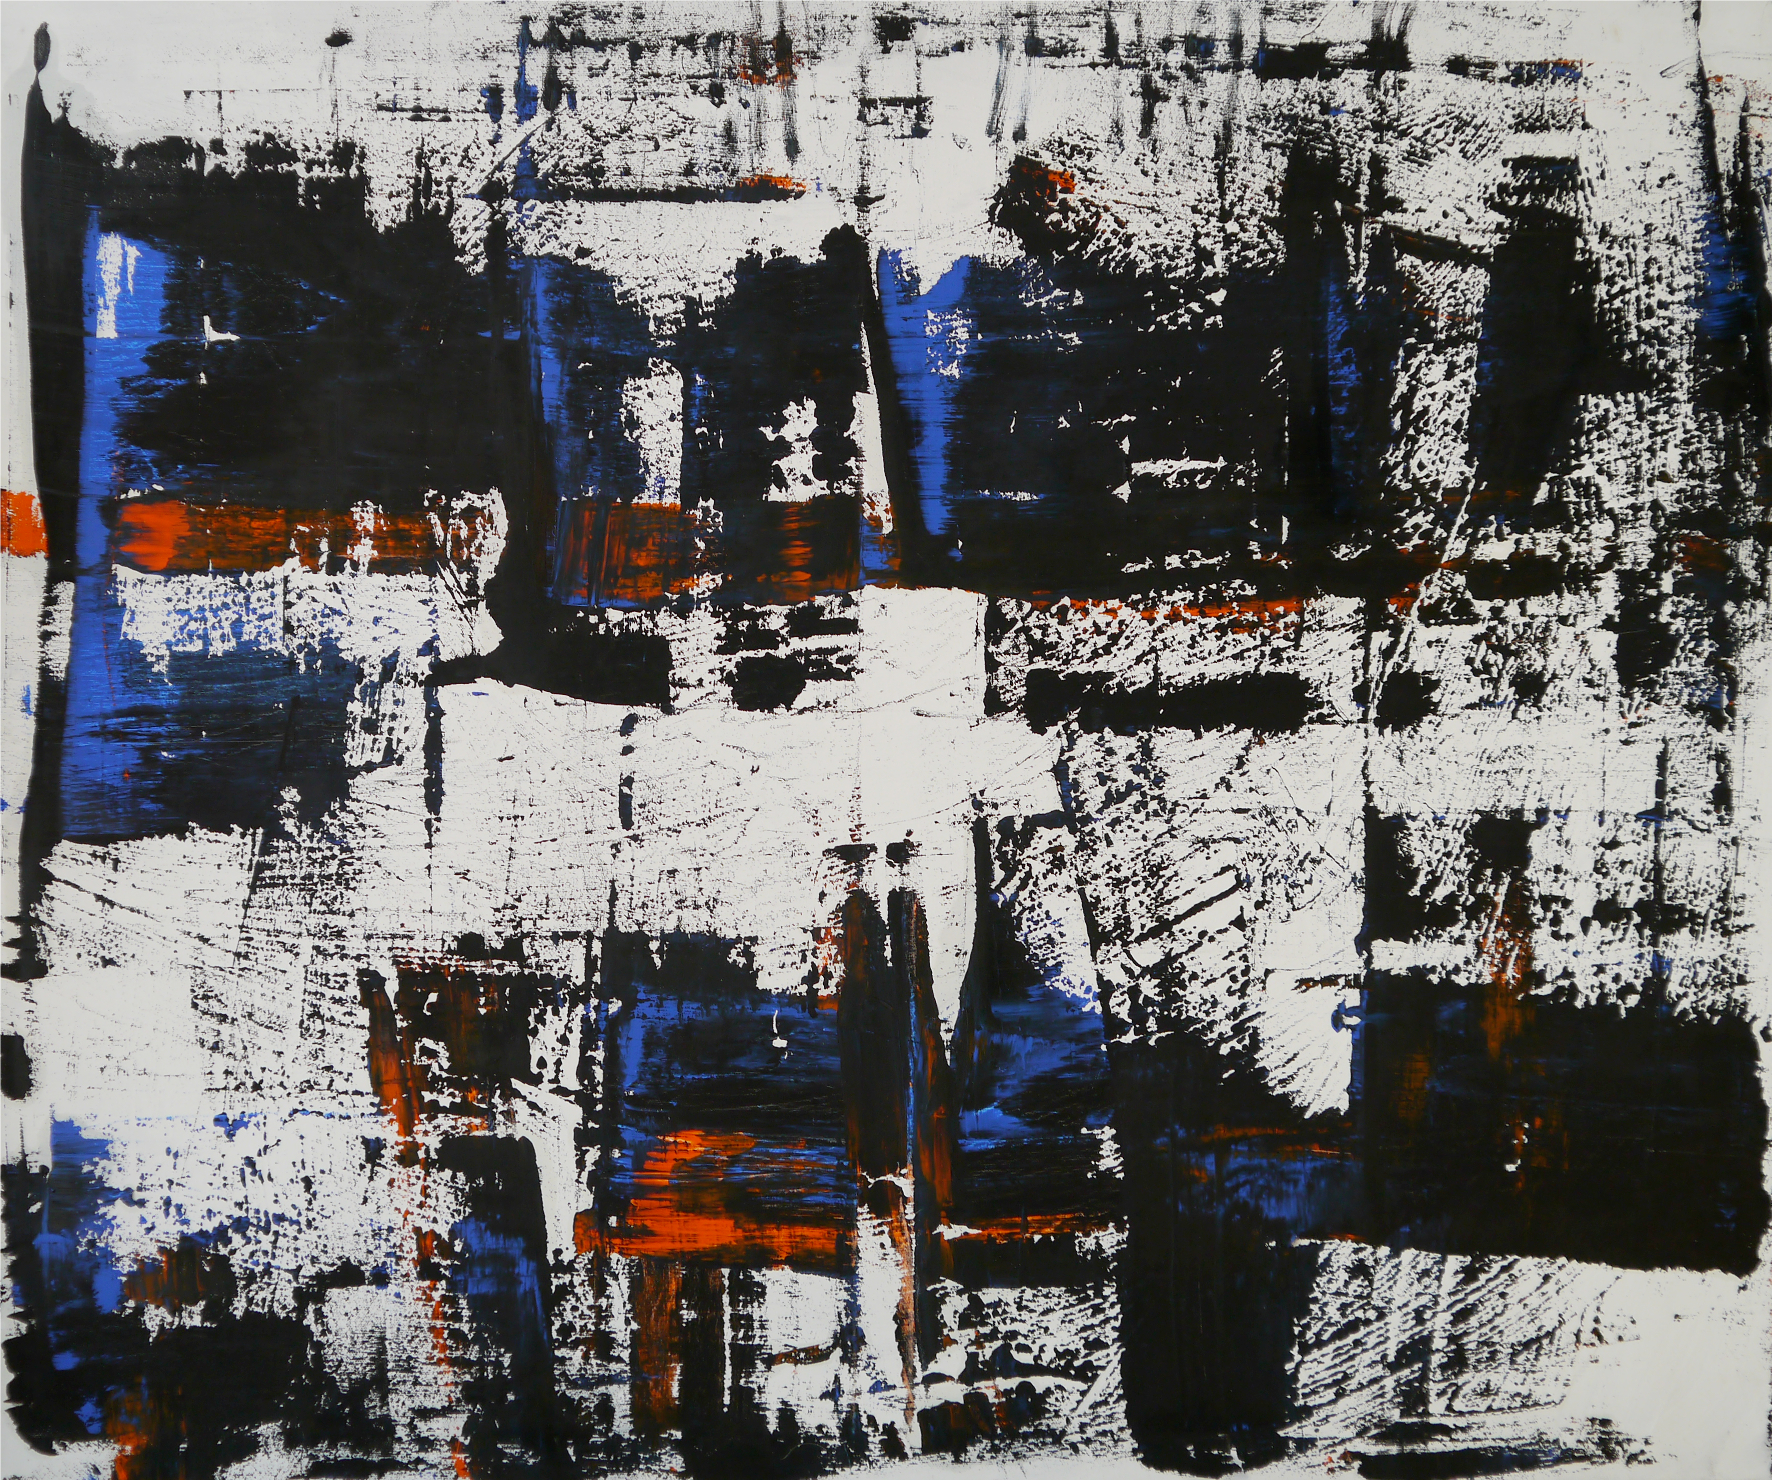 Painting_Notitle_60_70cm_oils_MartaWapiennik2016.jpg